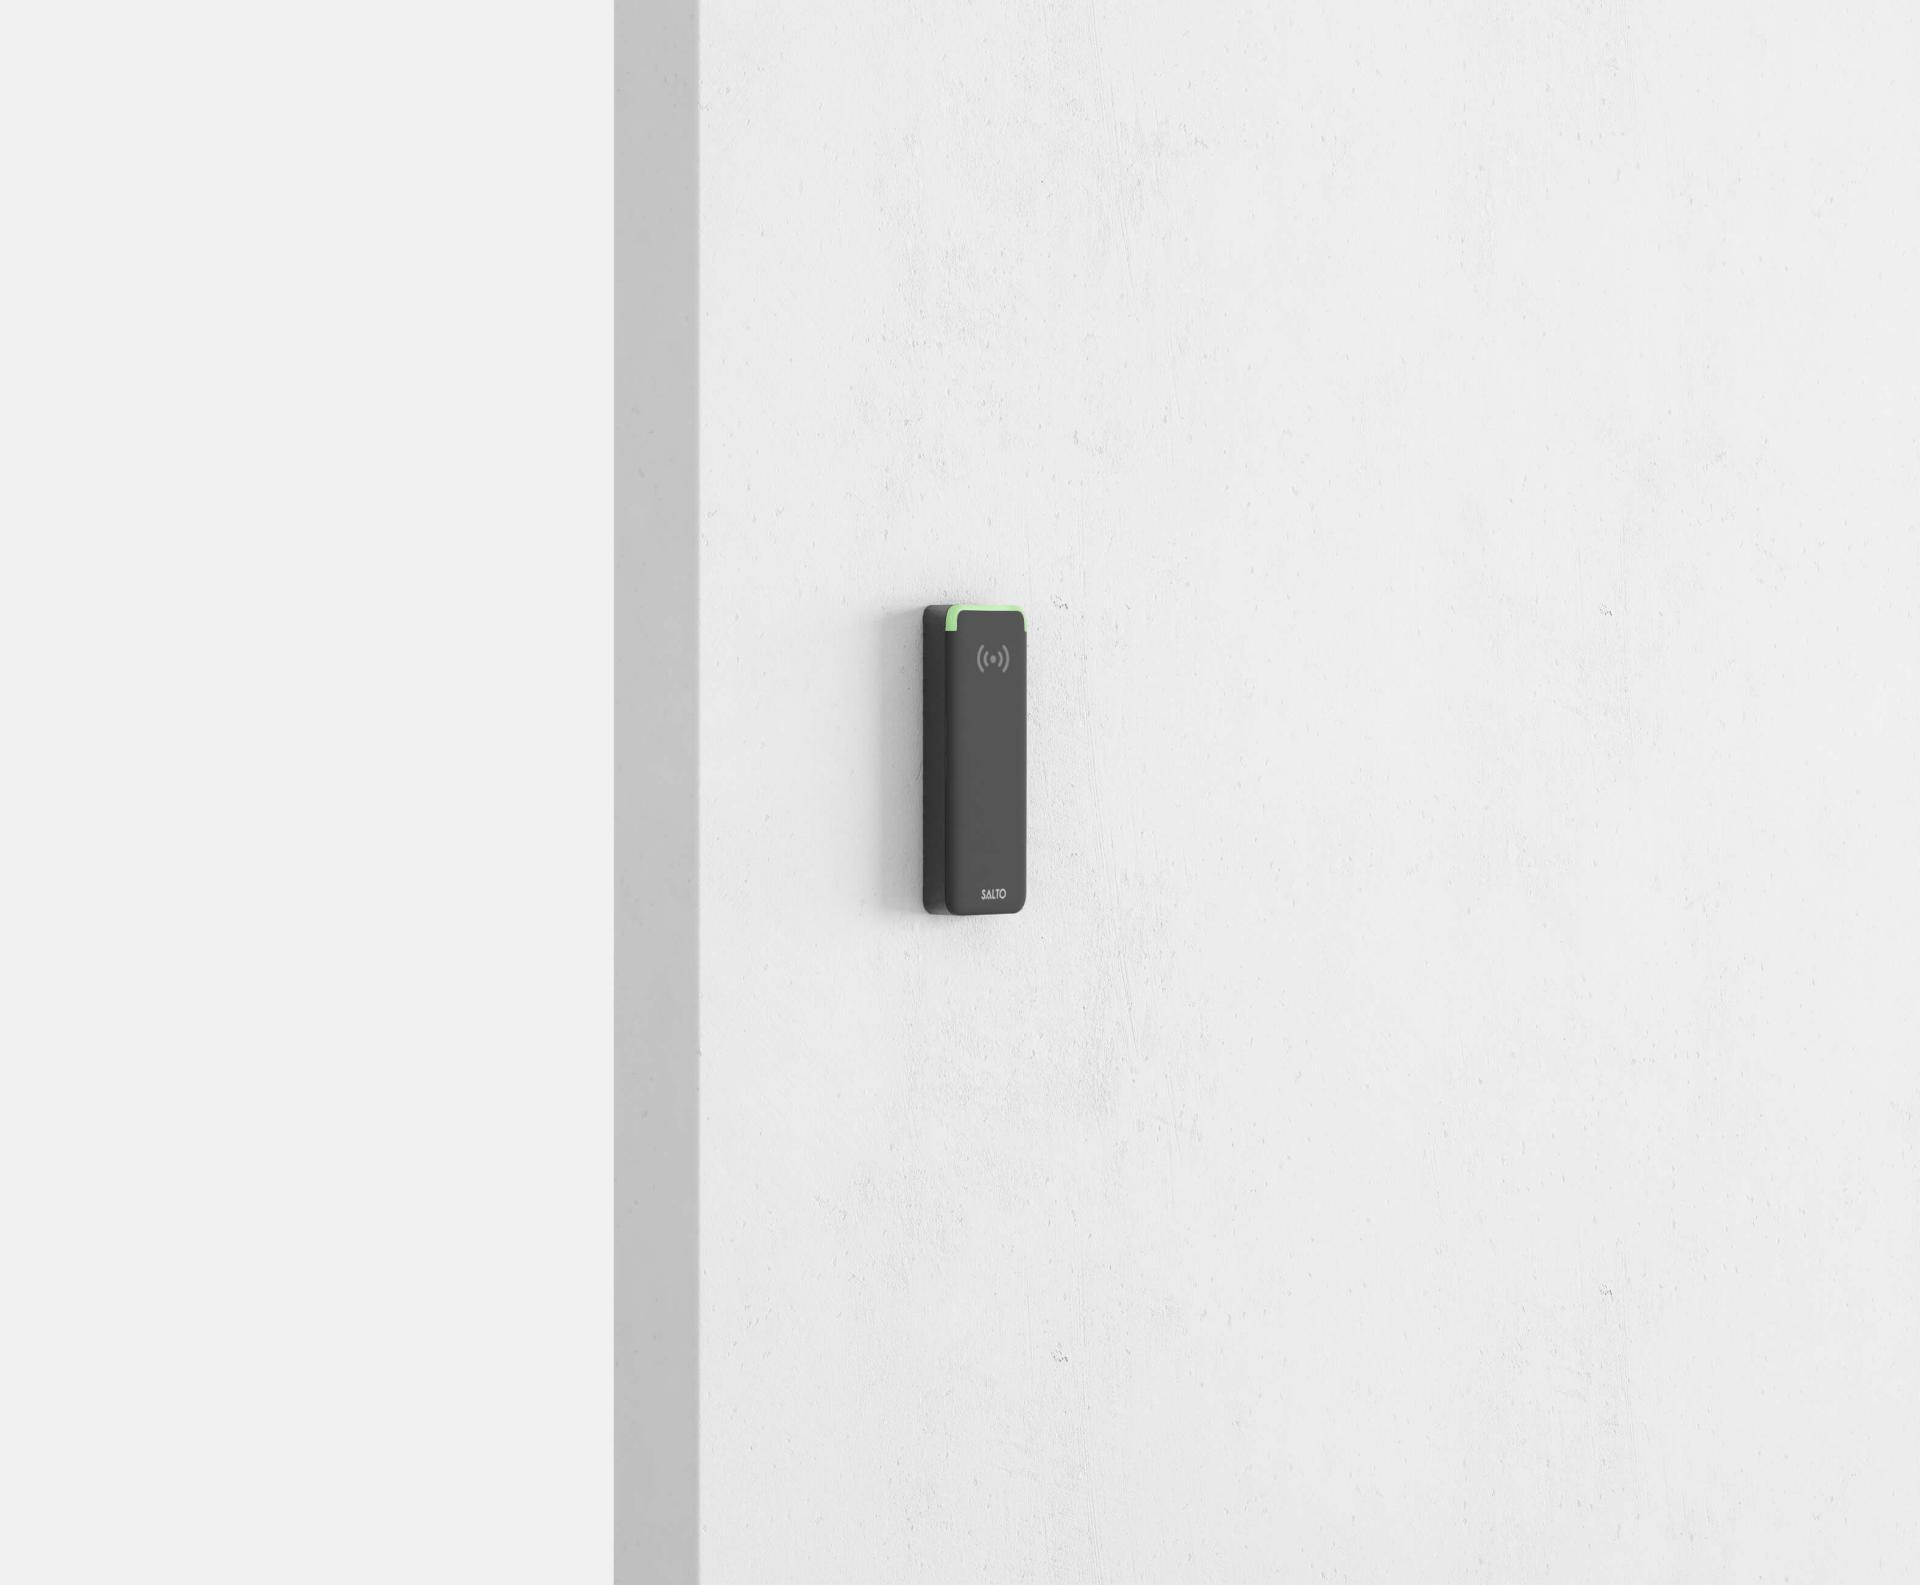 Design XS - Mullion Wall Reader